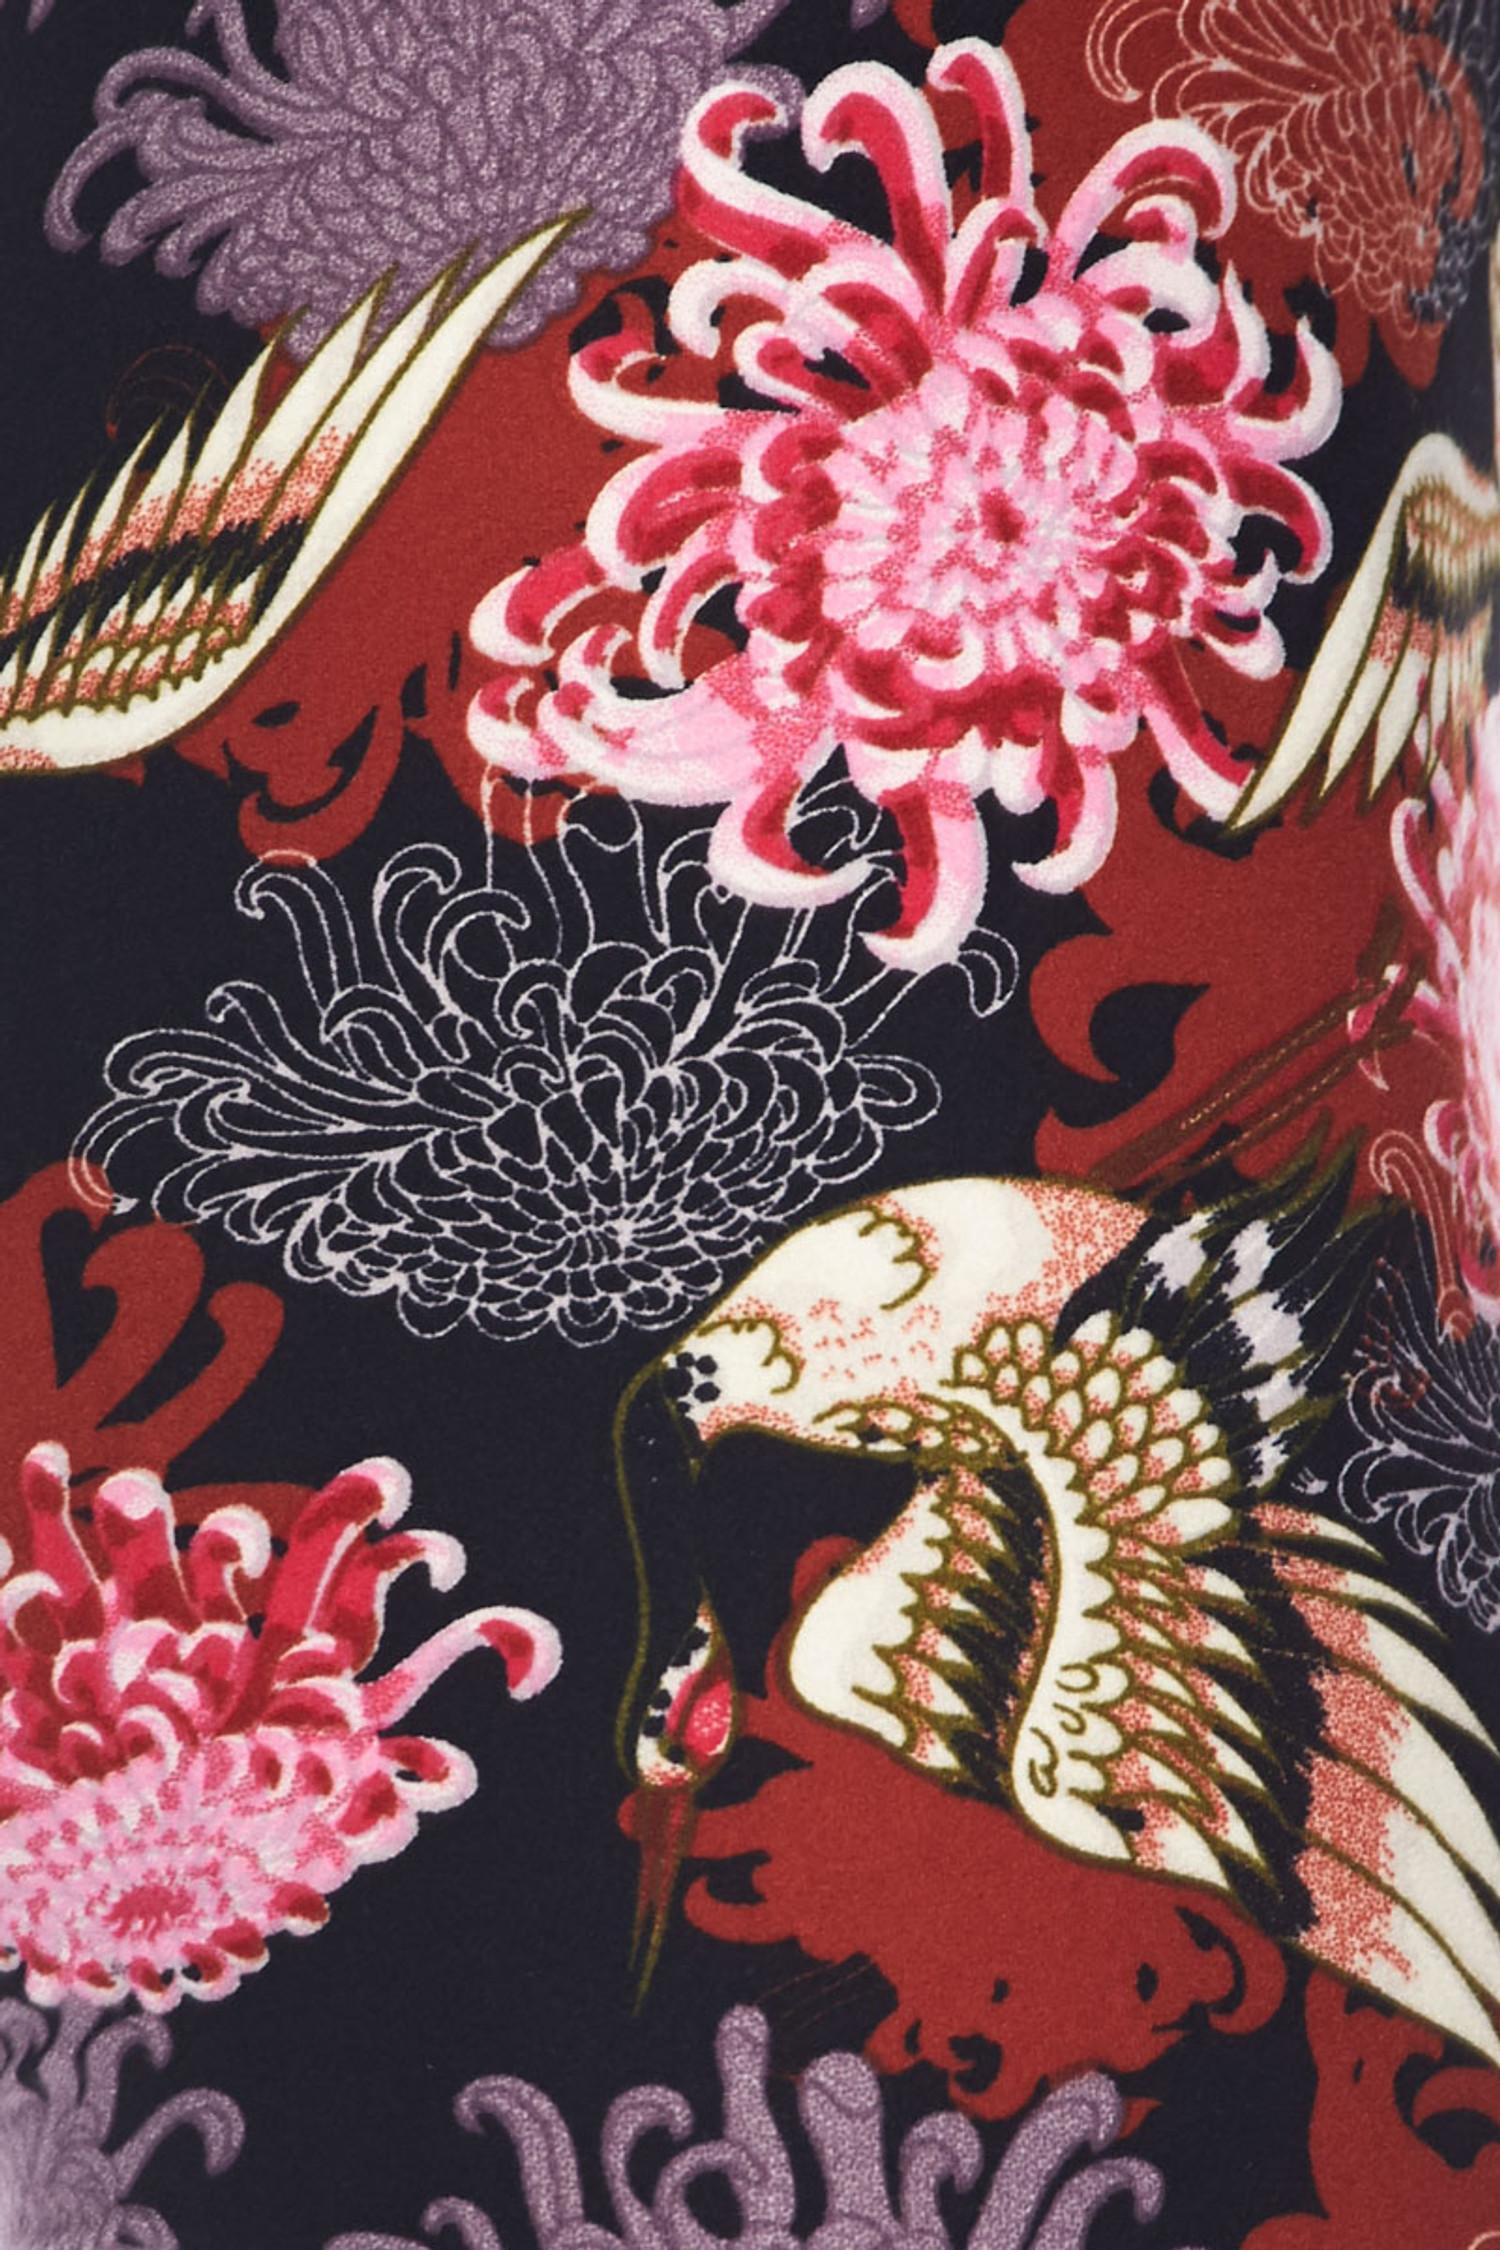 Brushed Japanese Cranes and Chrysanthemums Kids Leggings